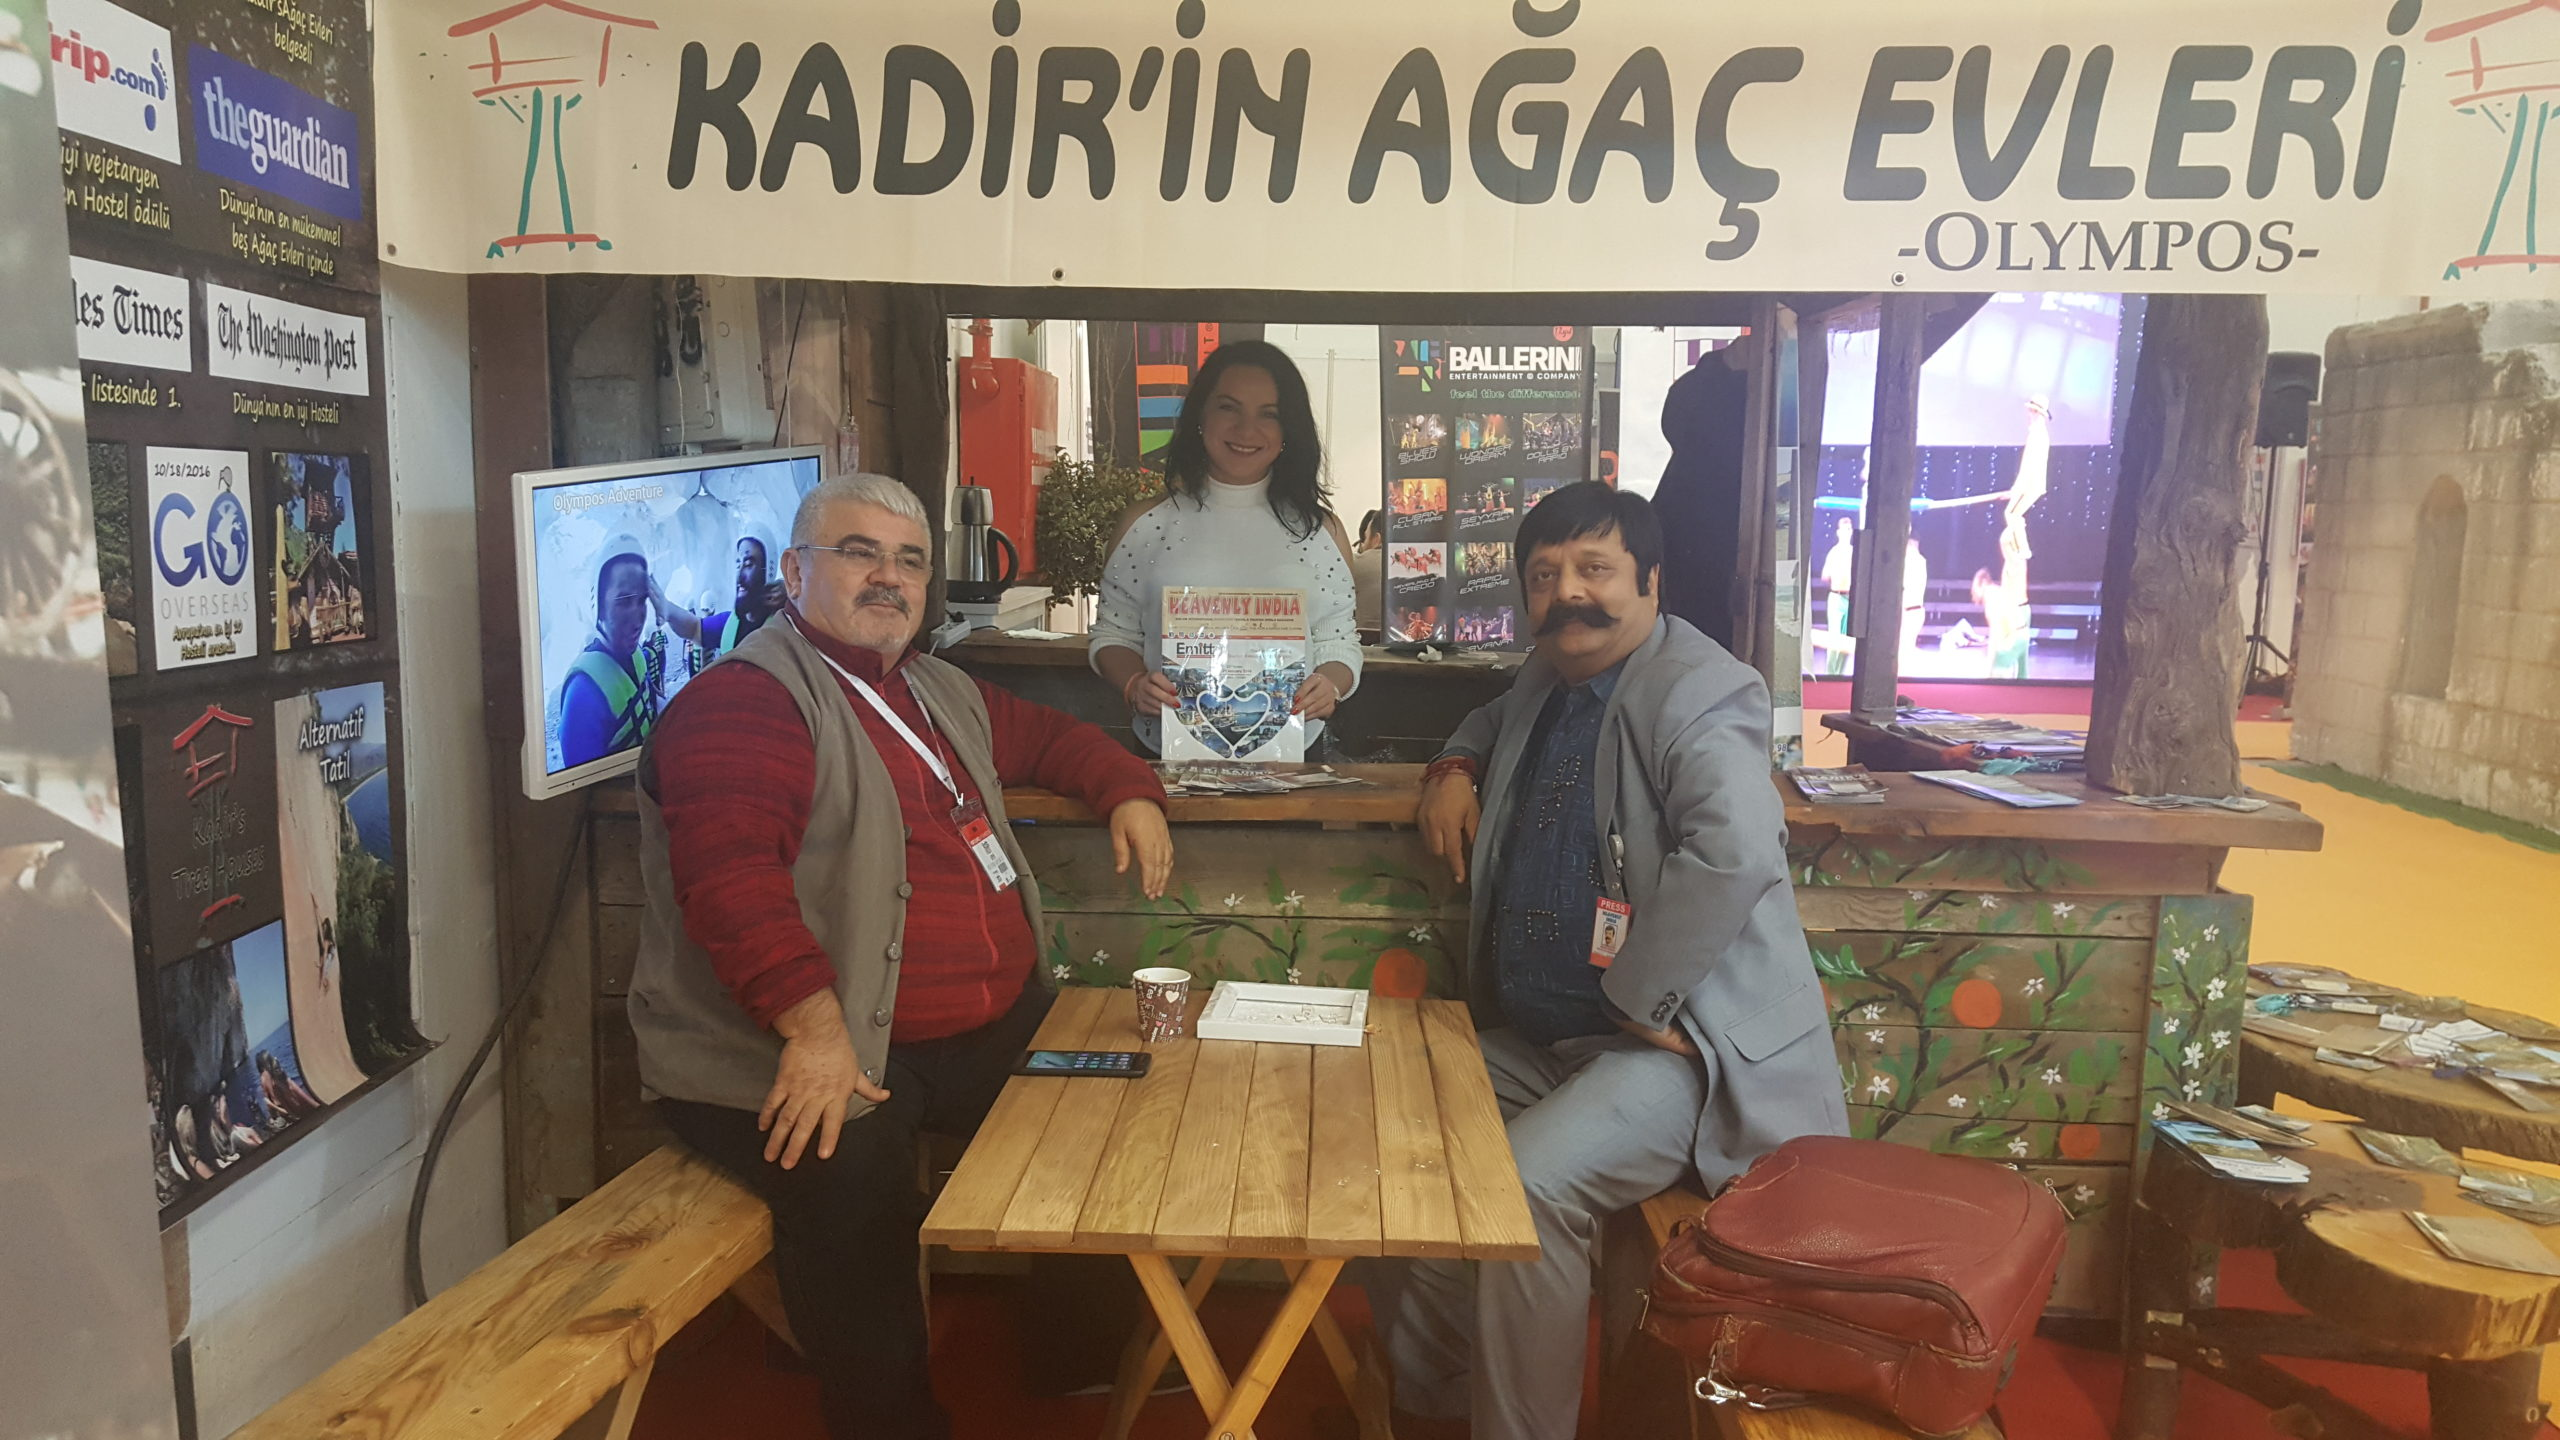 EMIT 2018 Istanbul, Turkey January 2018